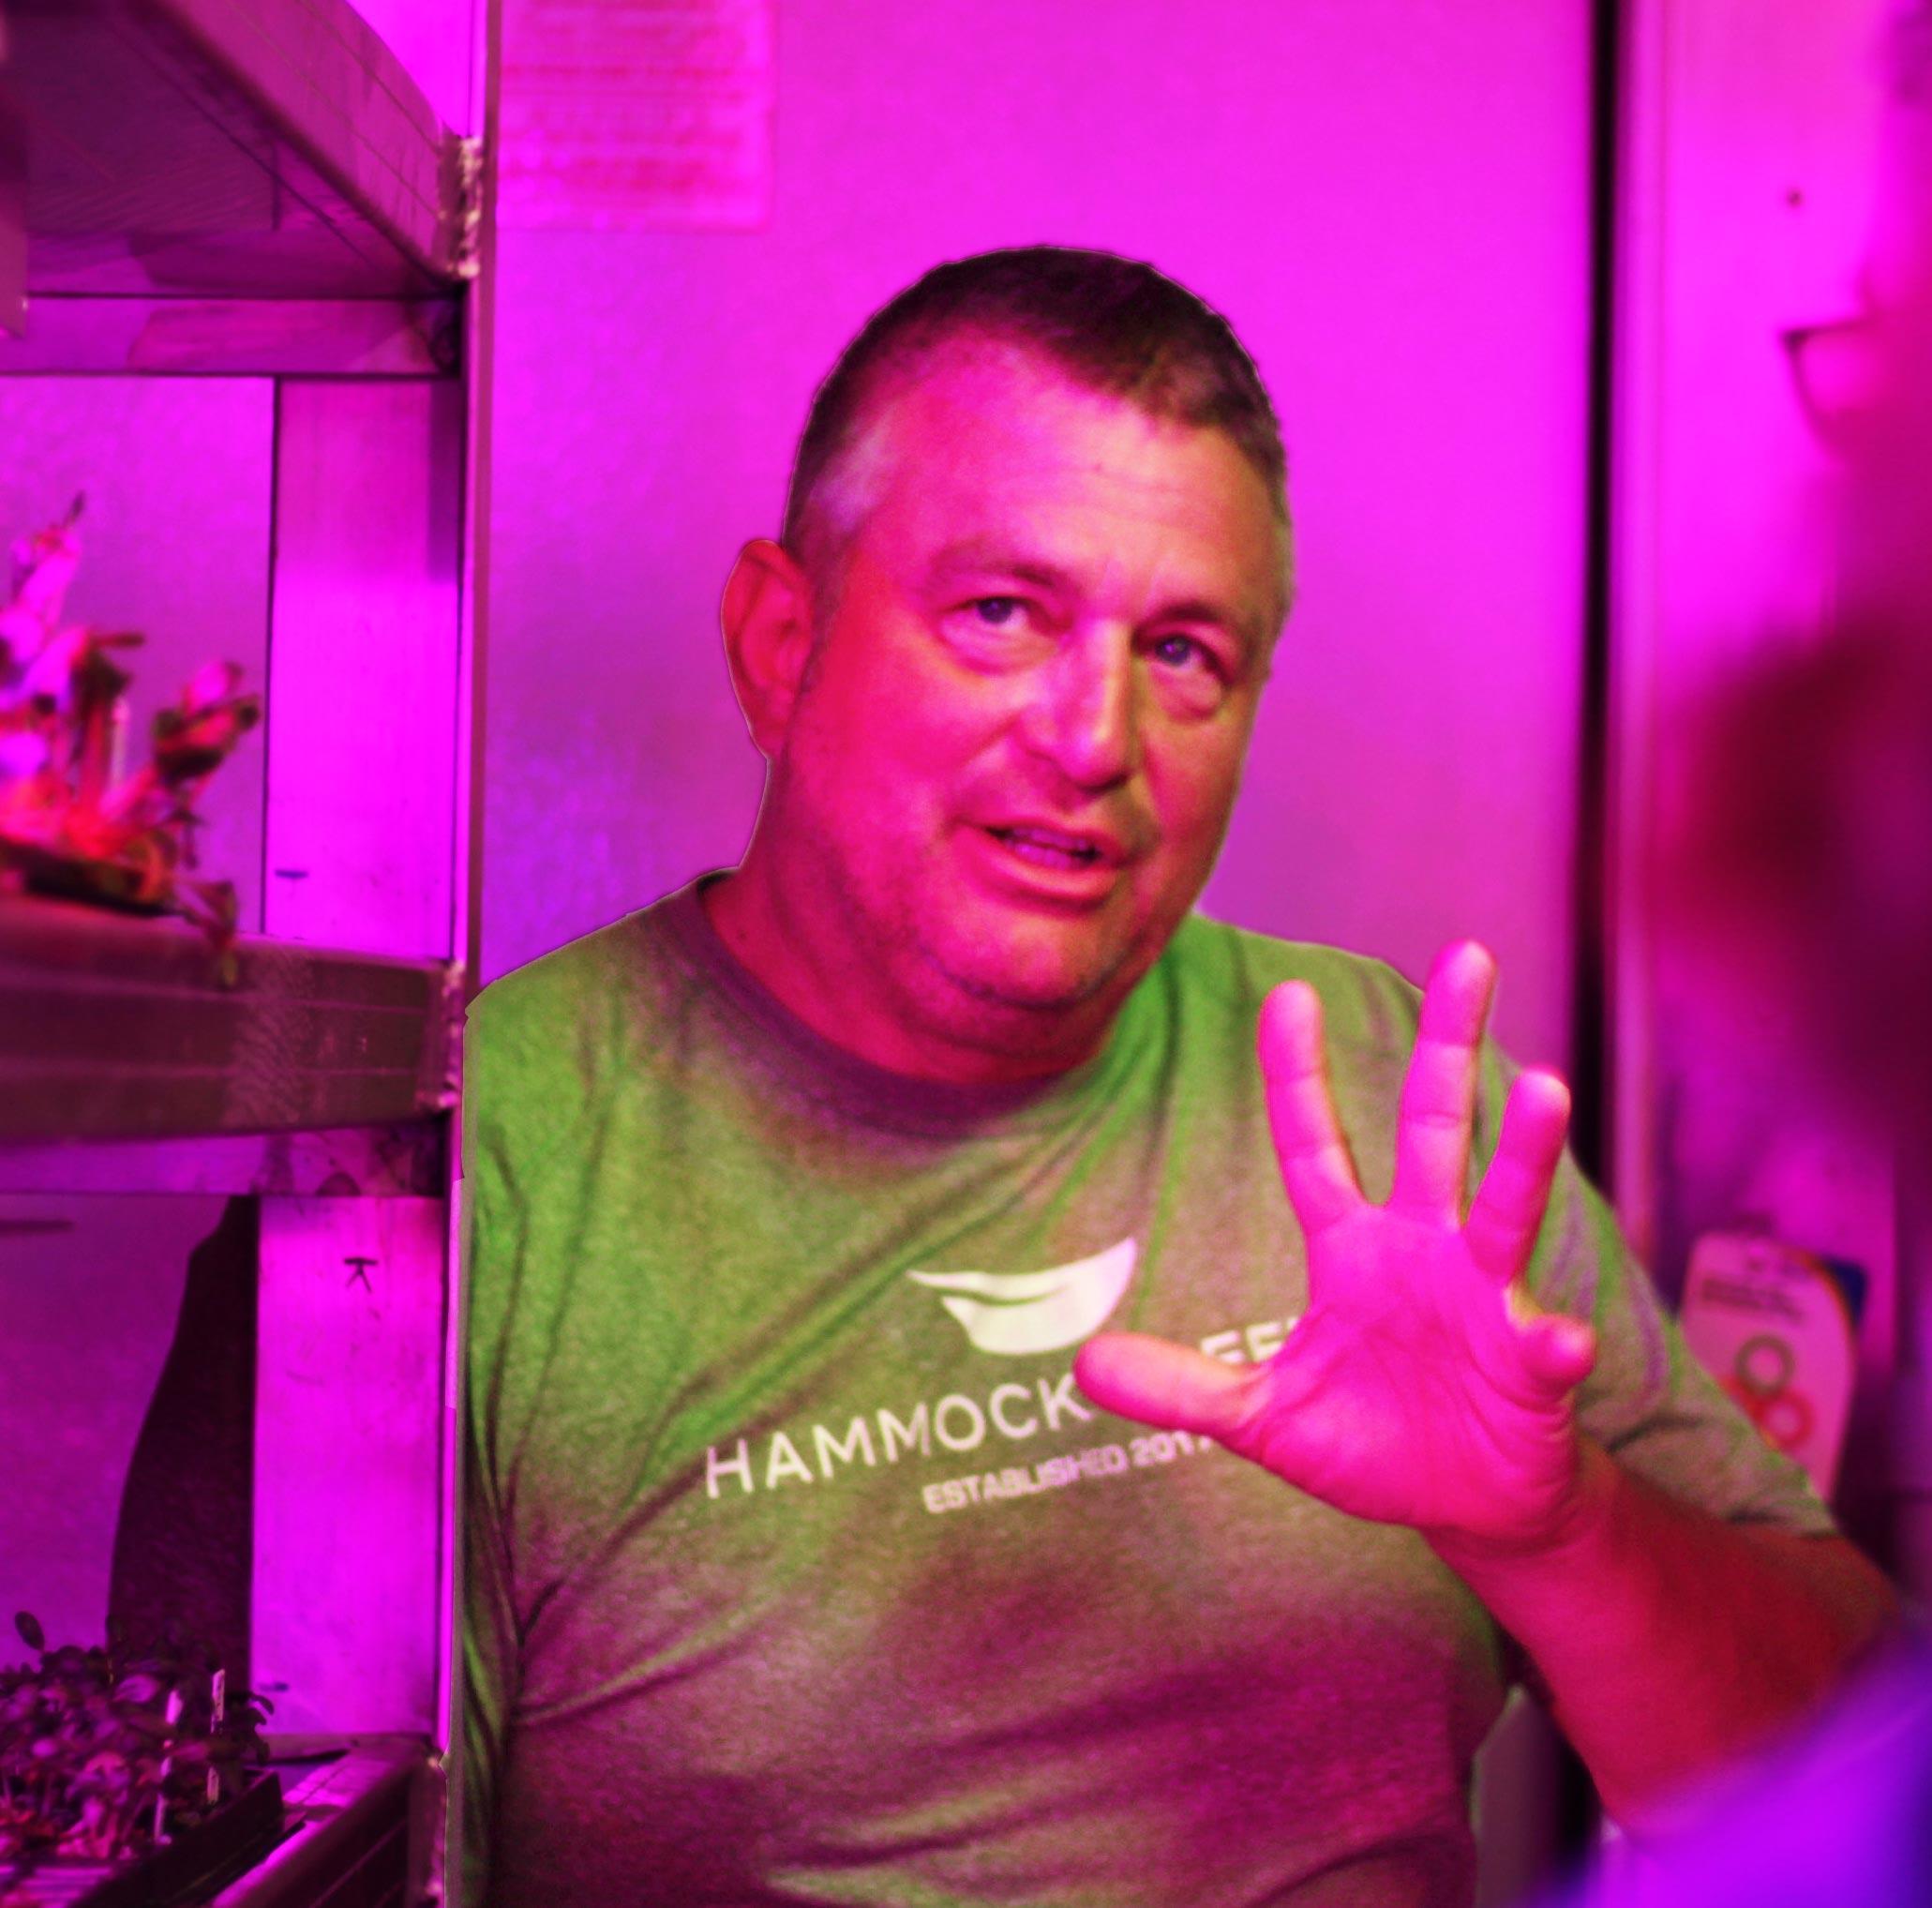 Hammock-Greens-Thomas.jpg